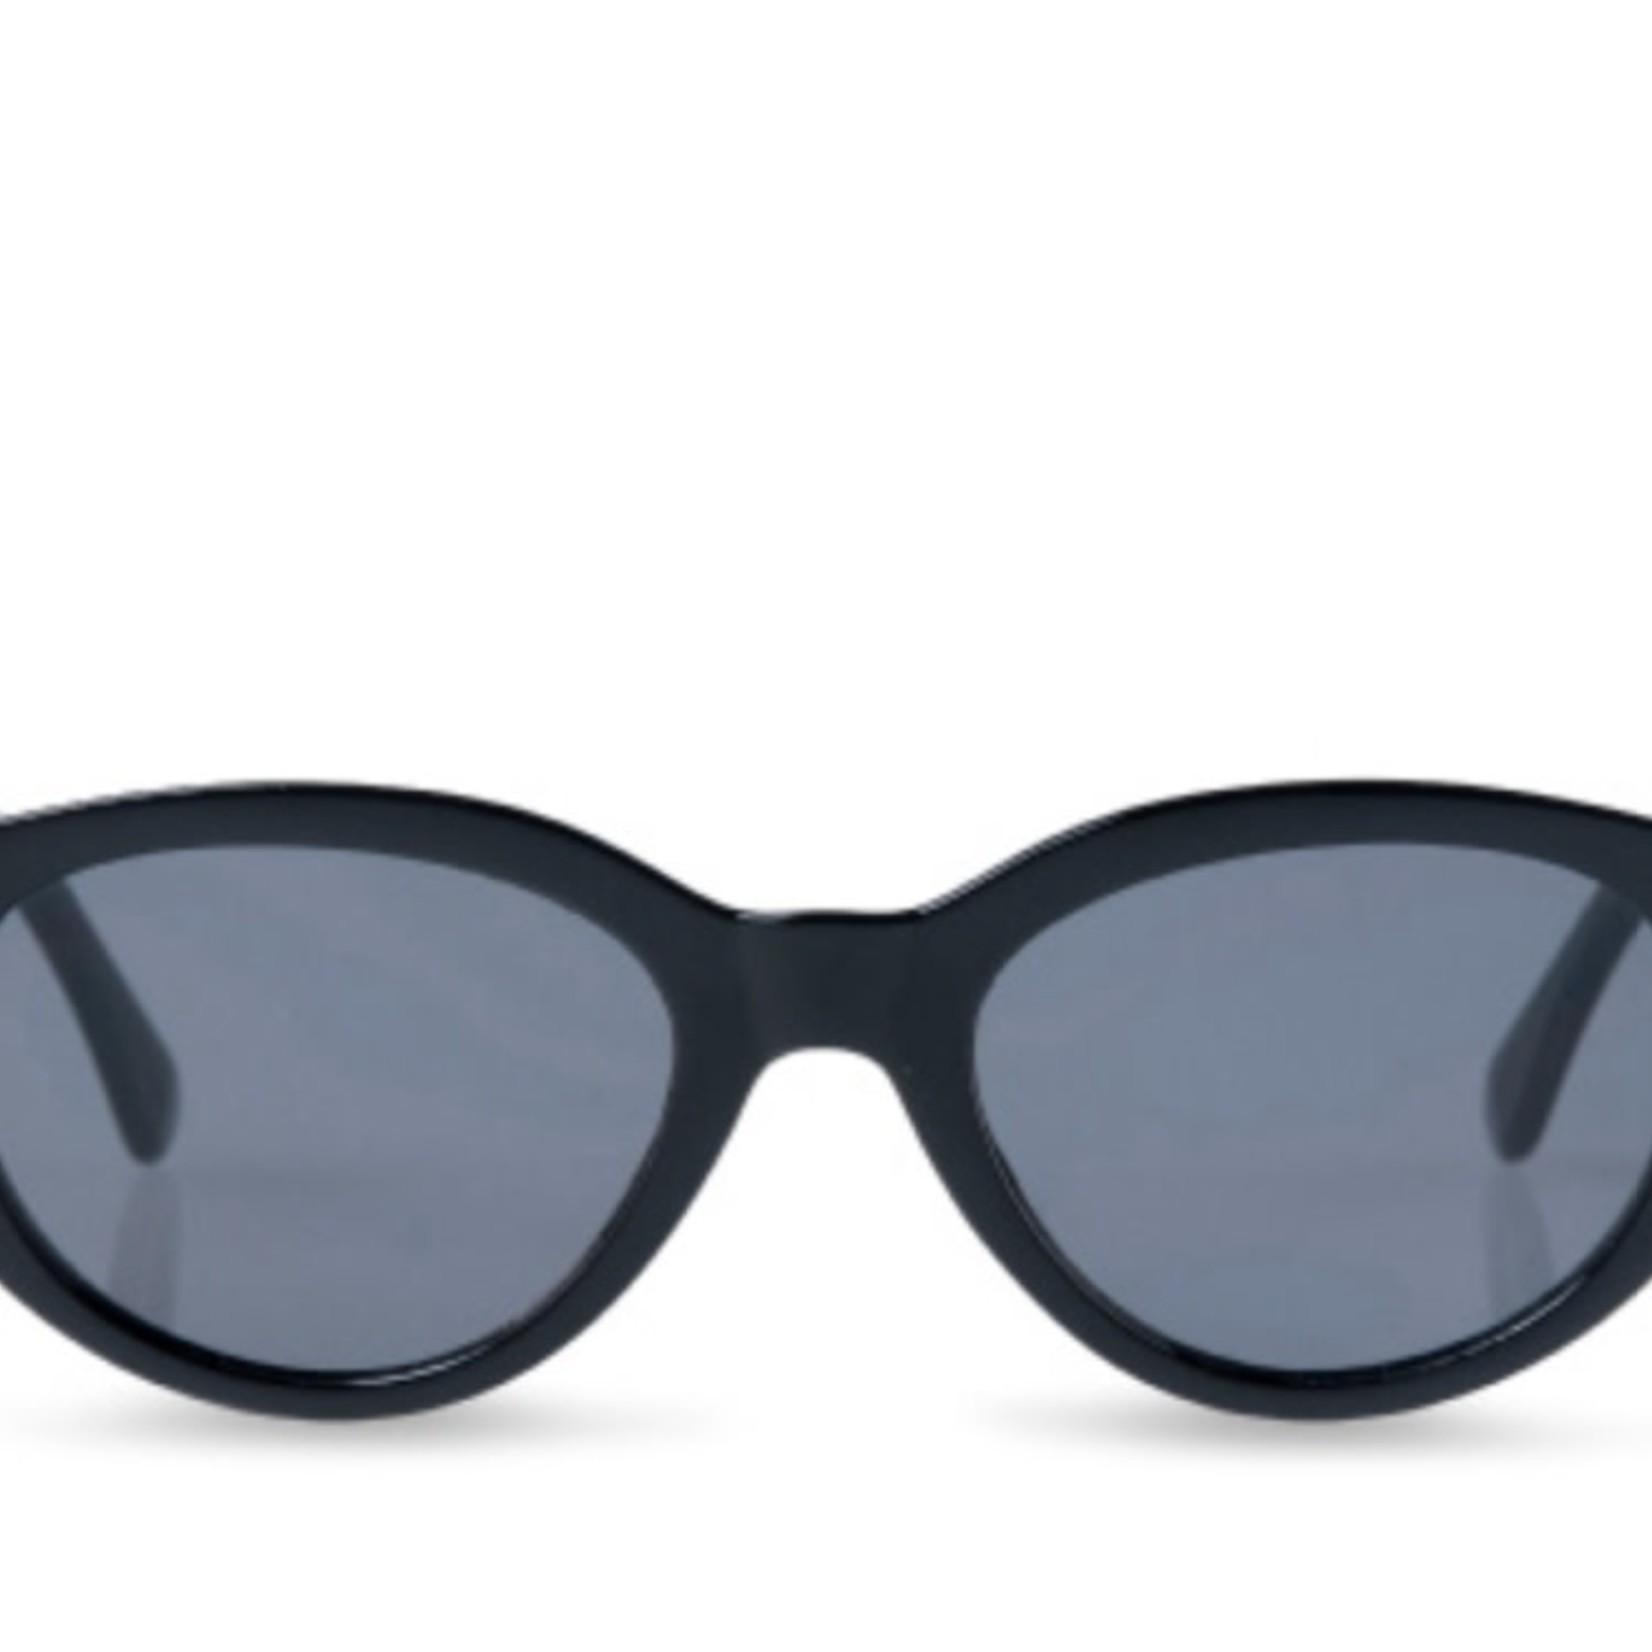 Reality Strict Machine Sunglasses